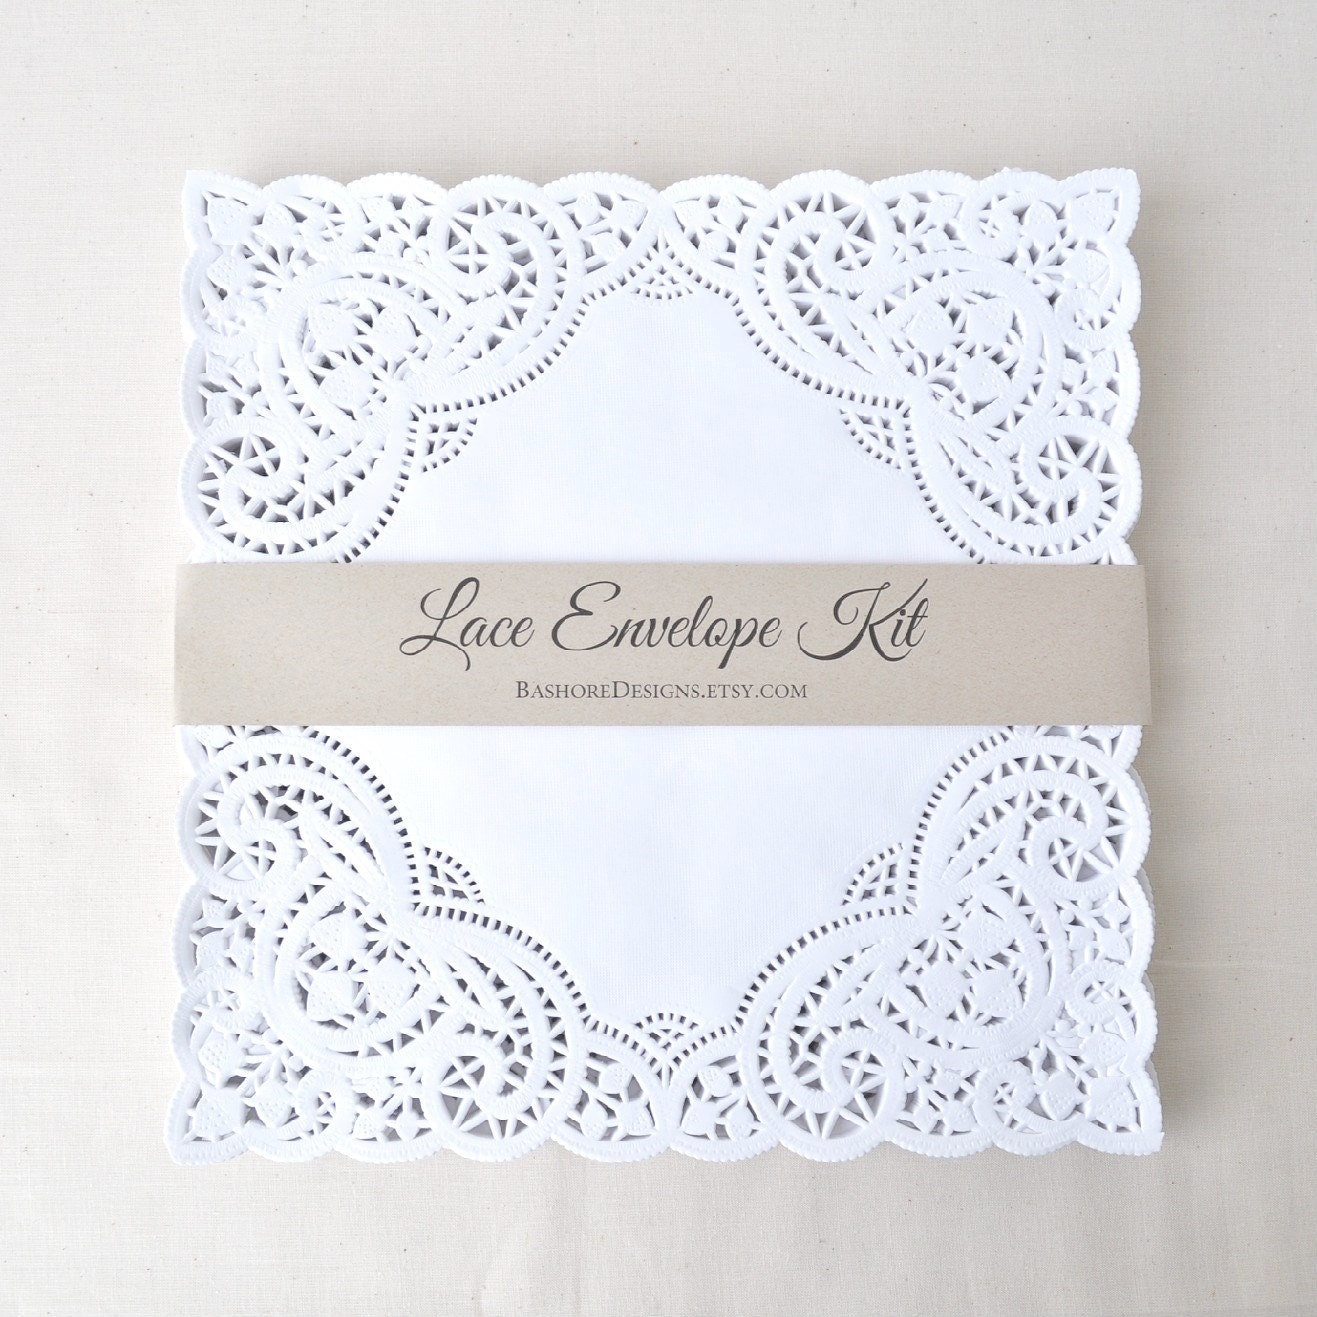 Diy lace envelope kit wedding invitation envelope liners paper lace